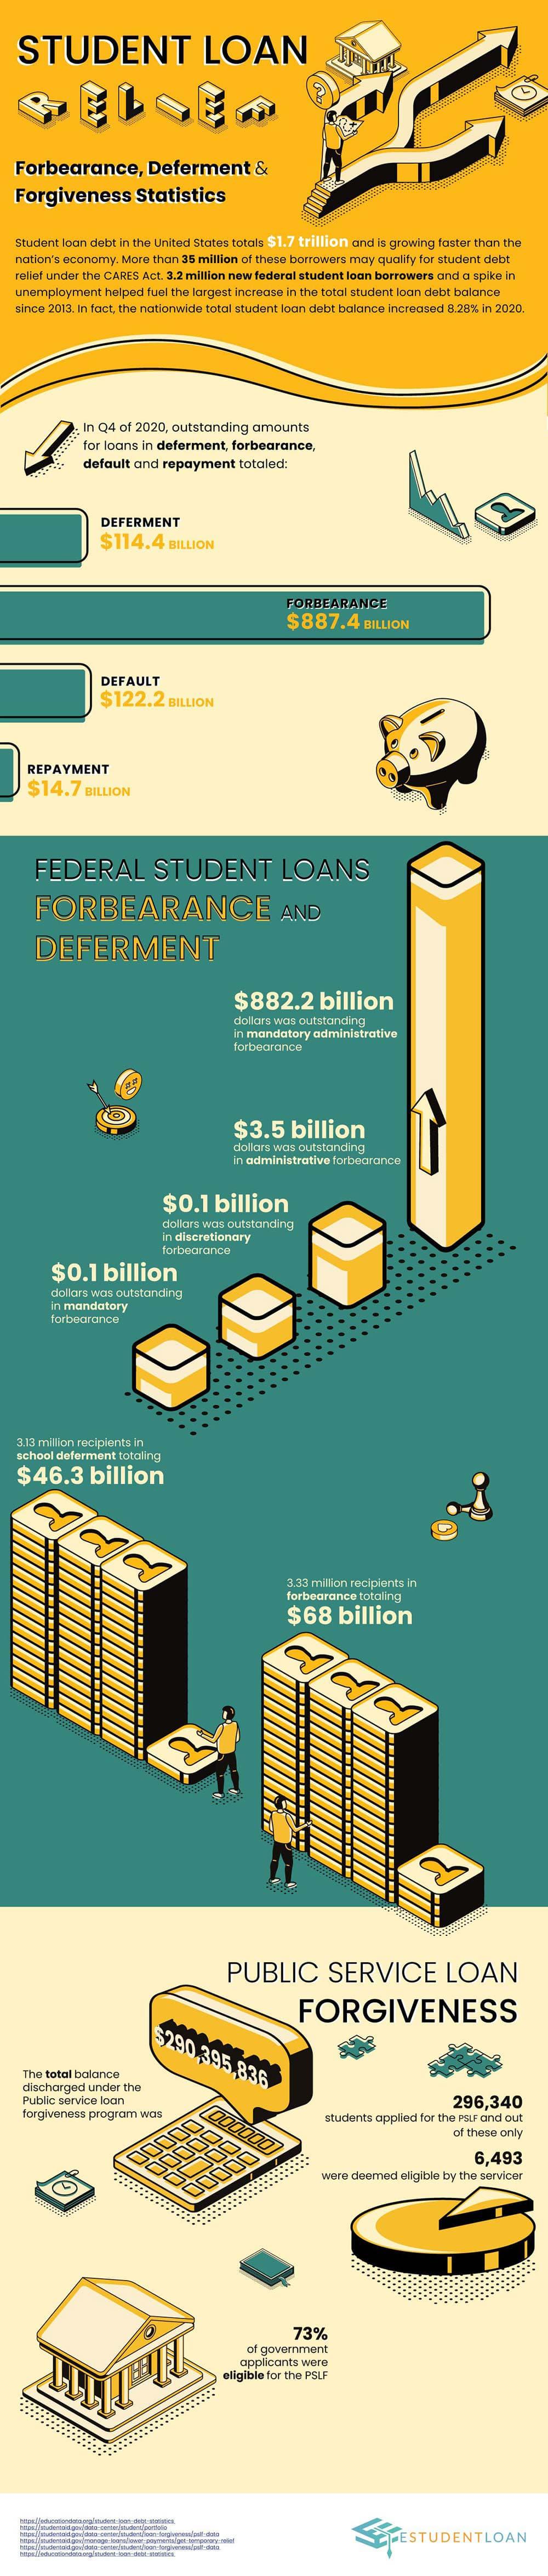 StudentLoan Forbearance Infographic